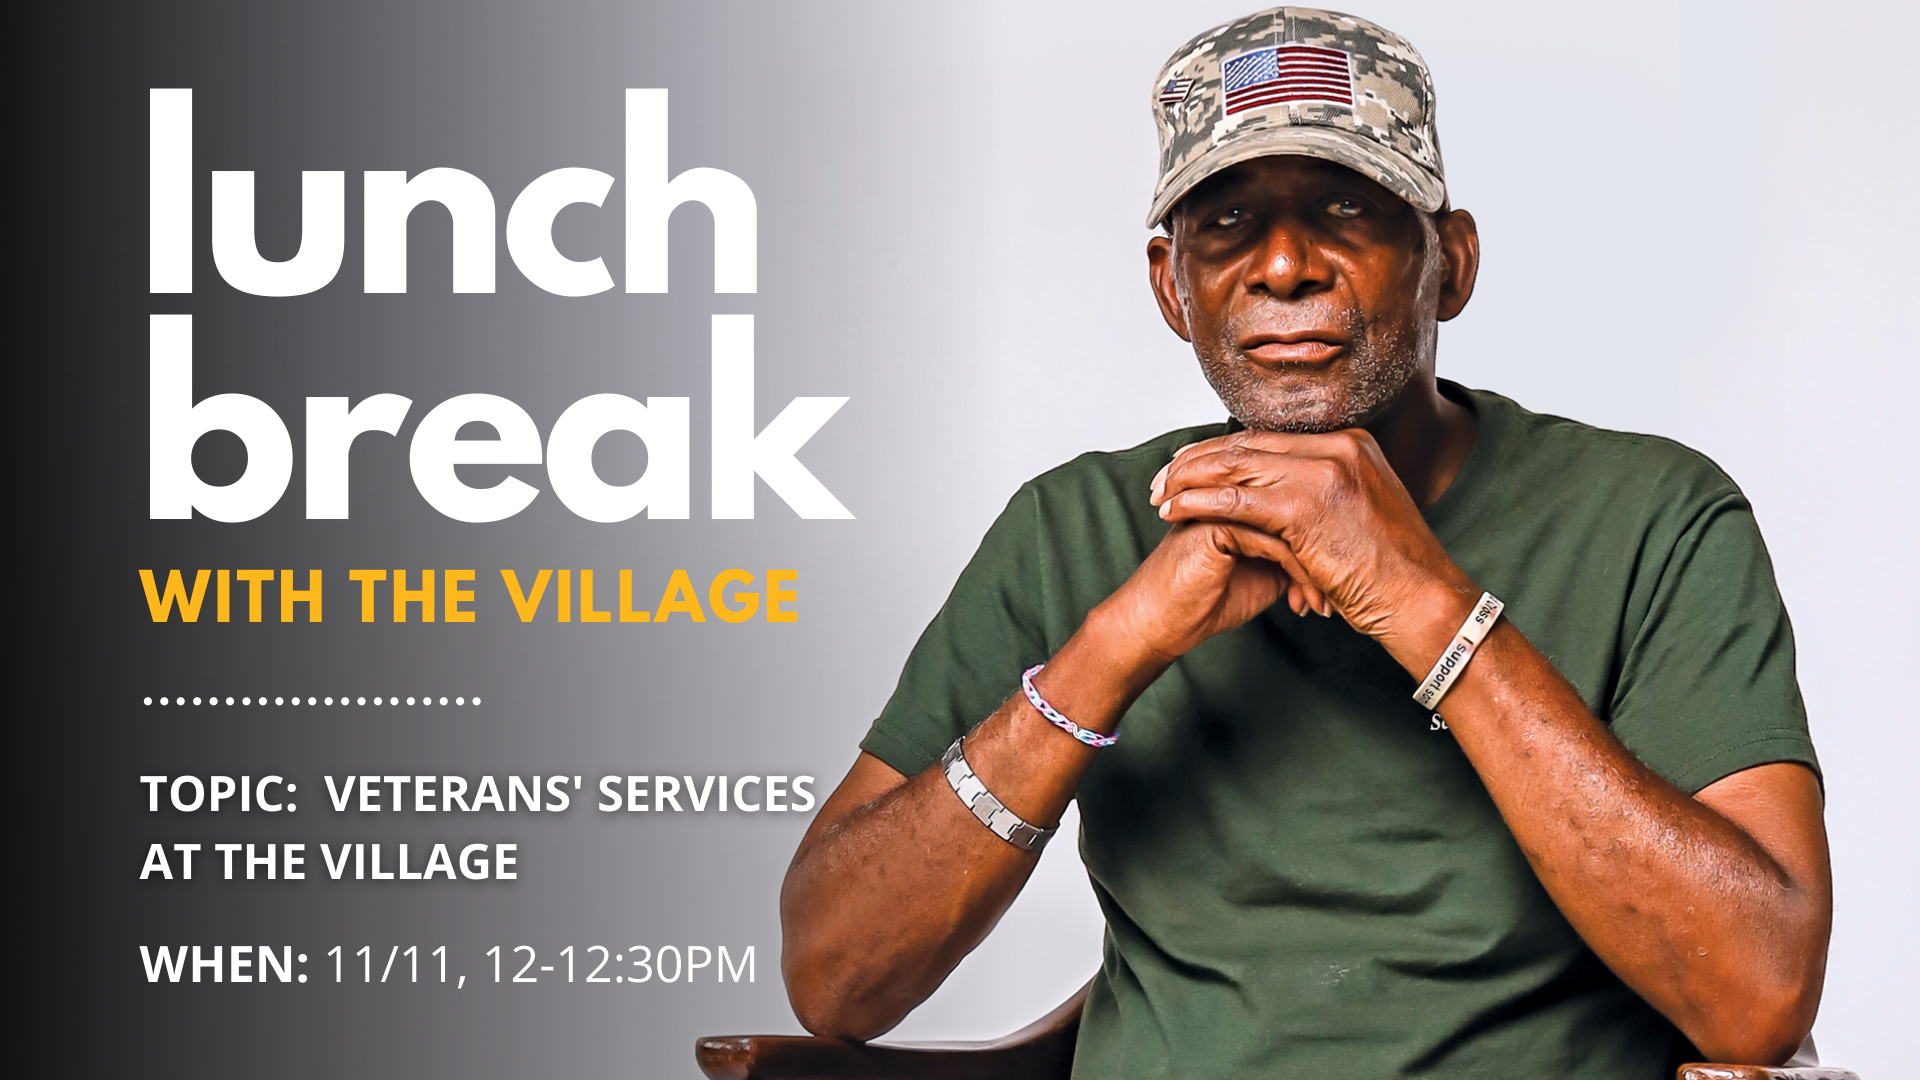 Lunch Break - Veterans' Services at The Village